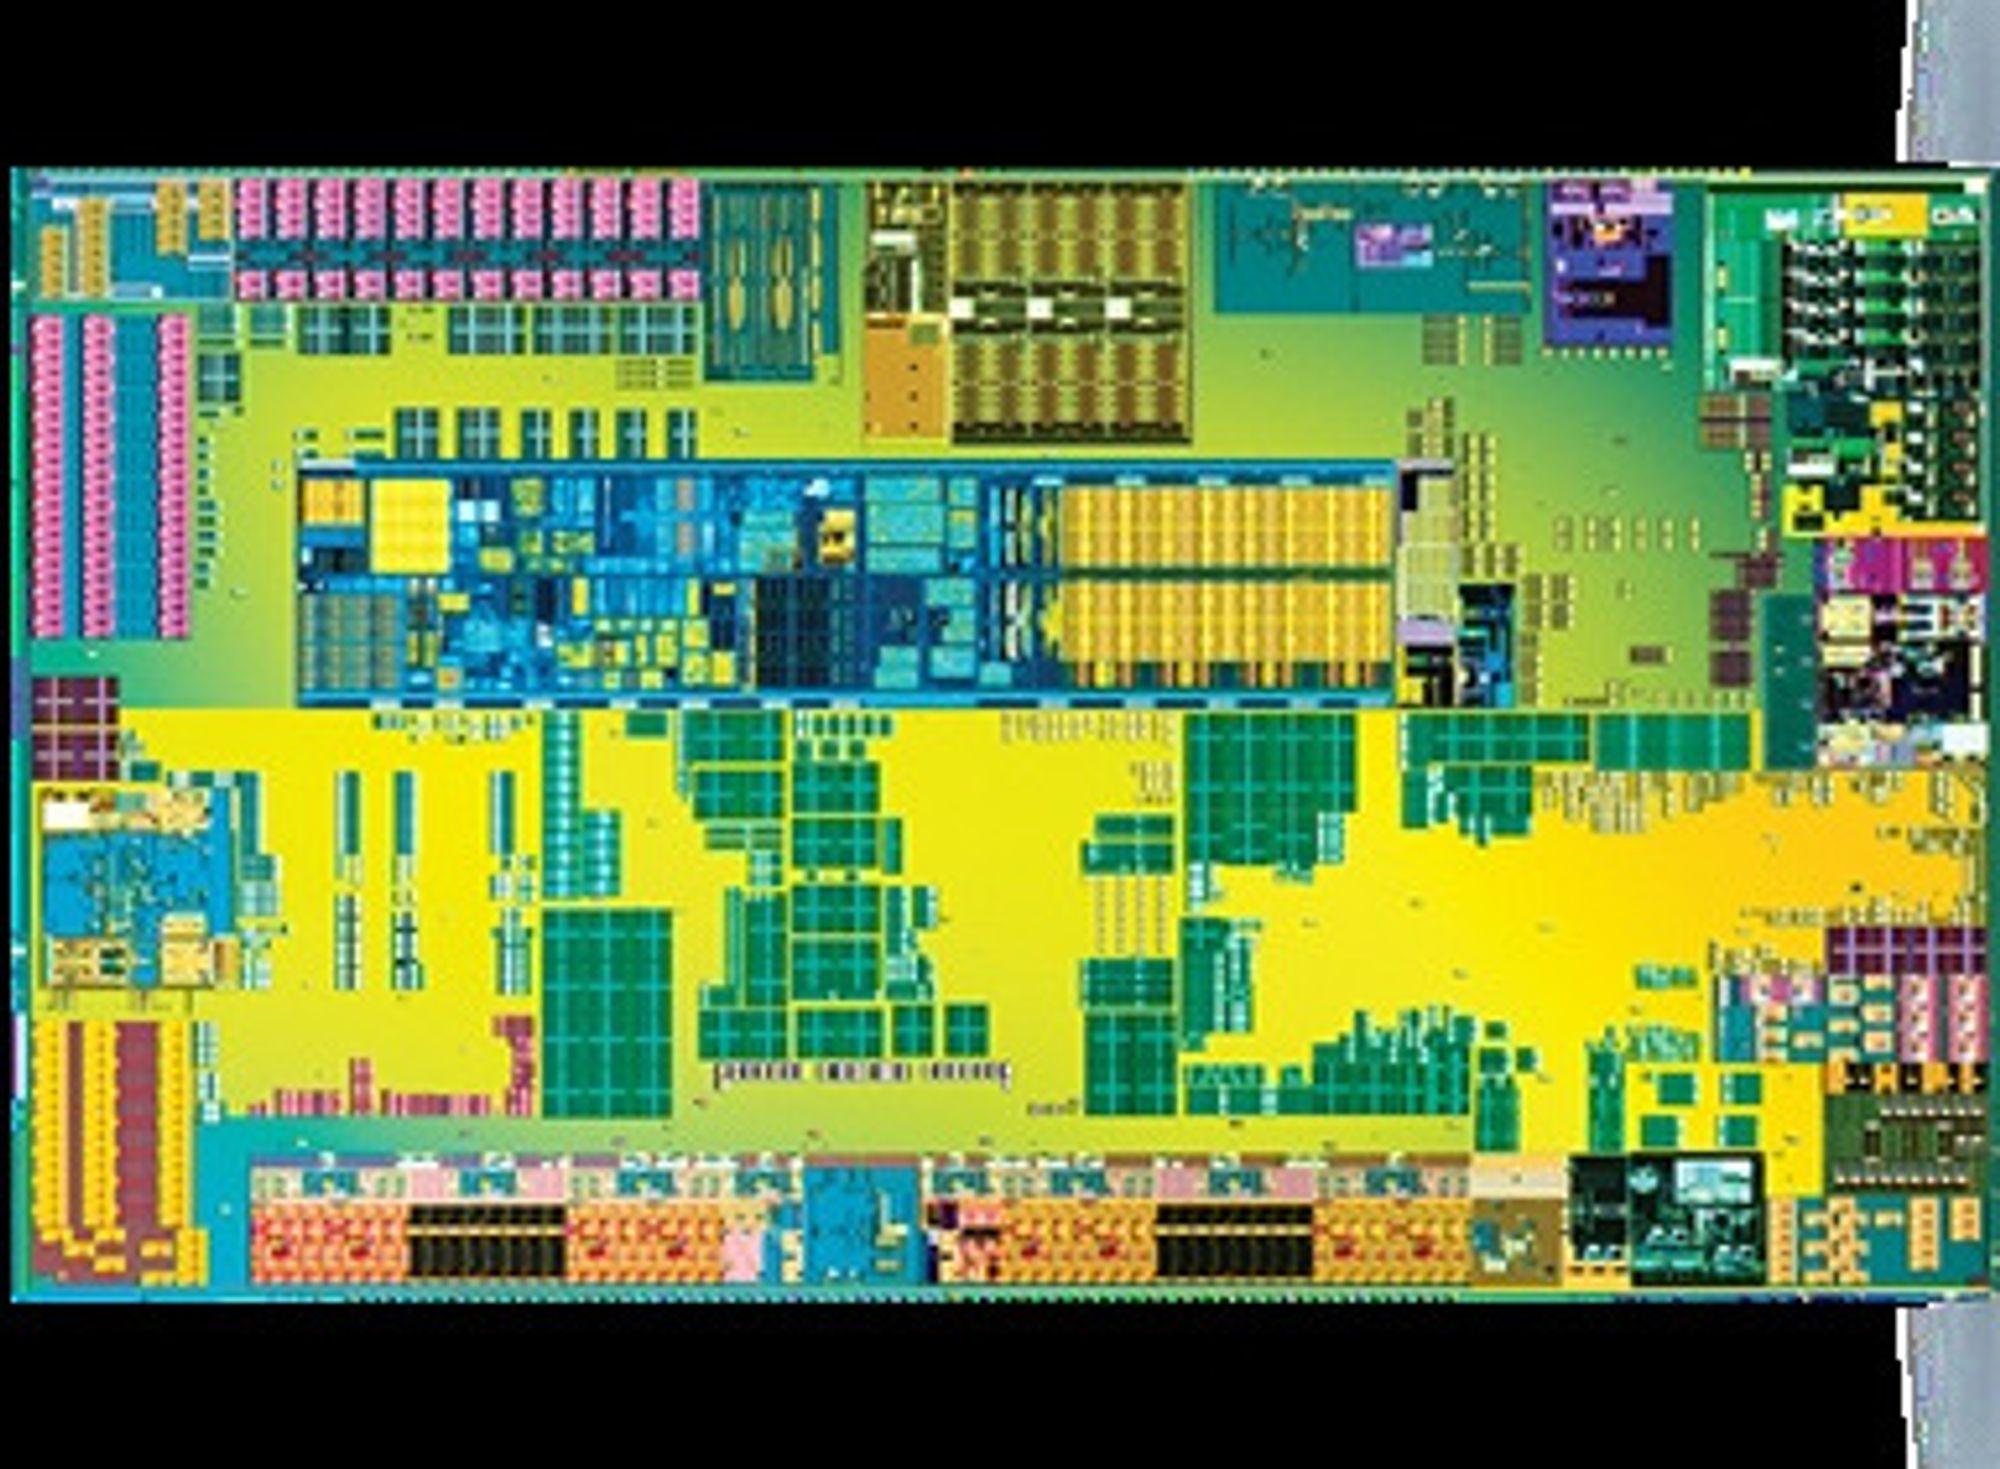 Innmaten i Intel Atom Z670.